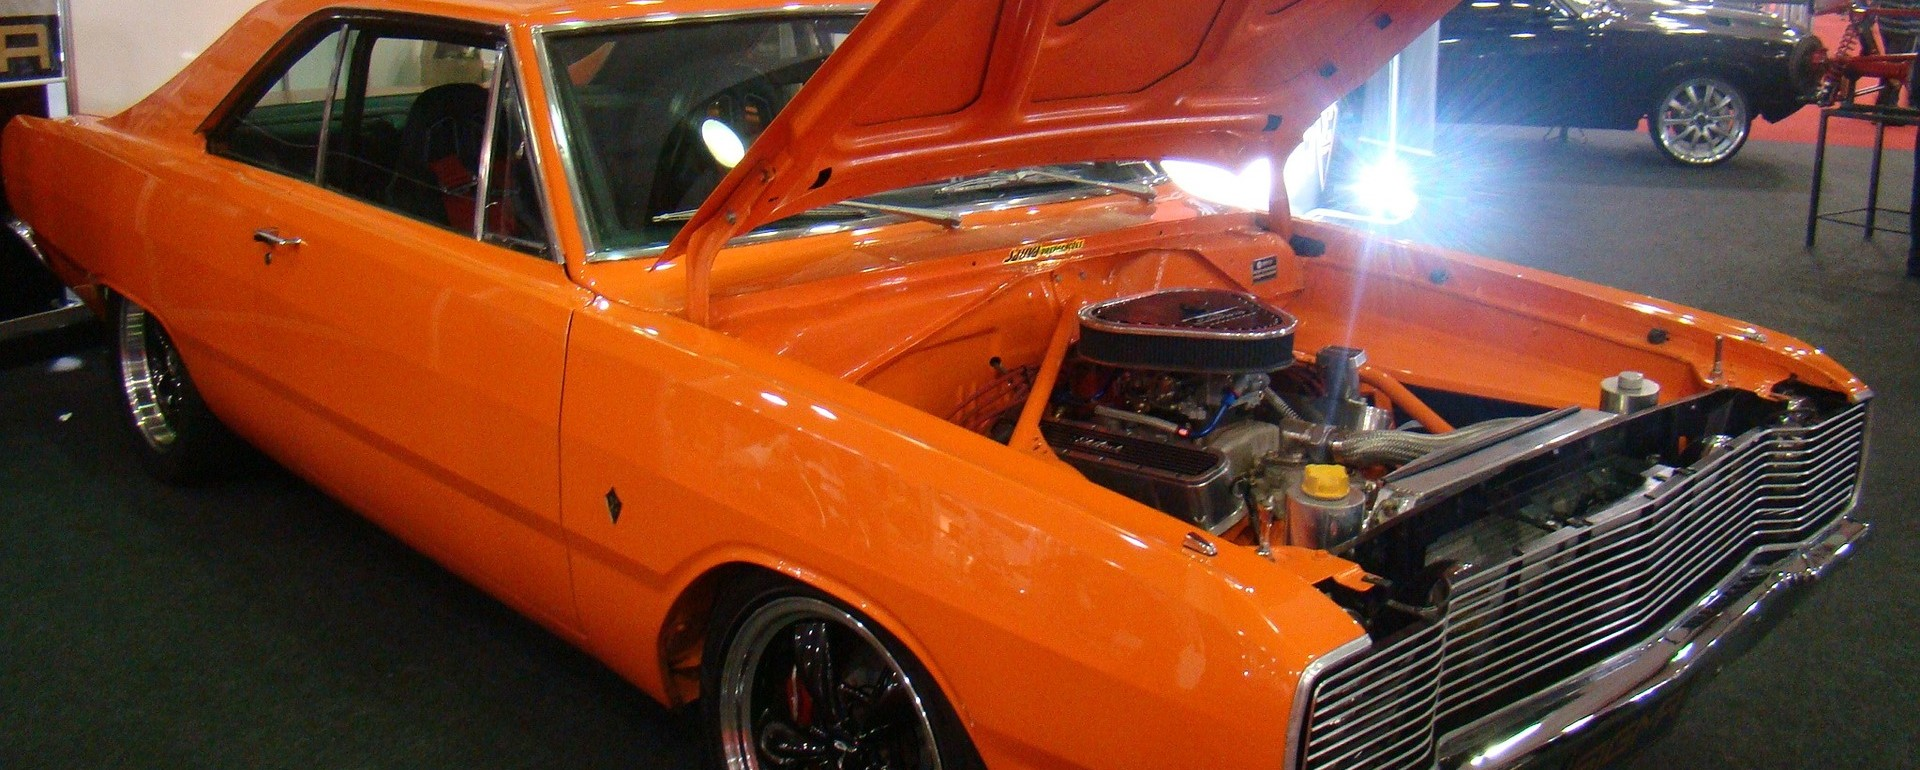 Oldtimer Car in Wheaton, Maryland | Breast Cancer Car Donations